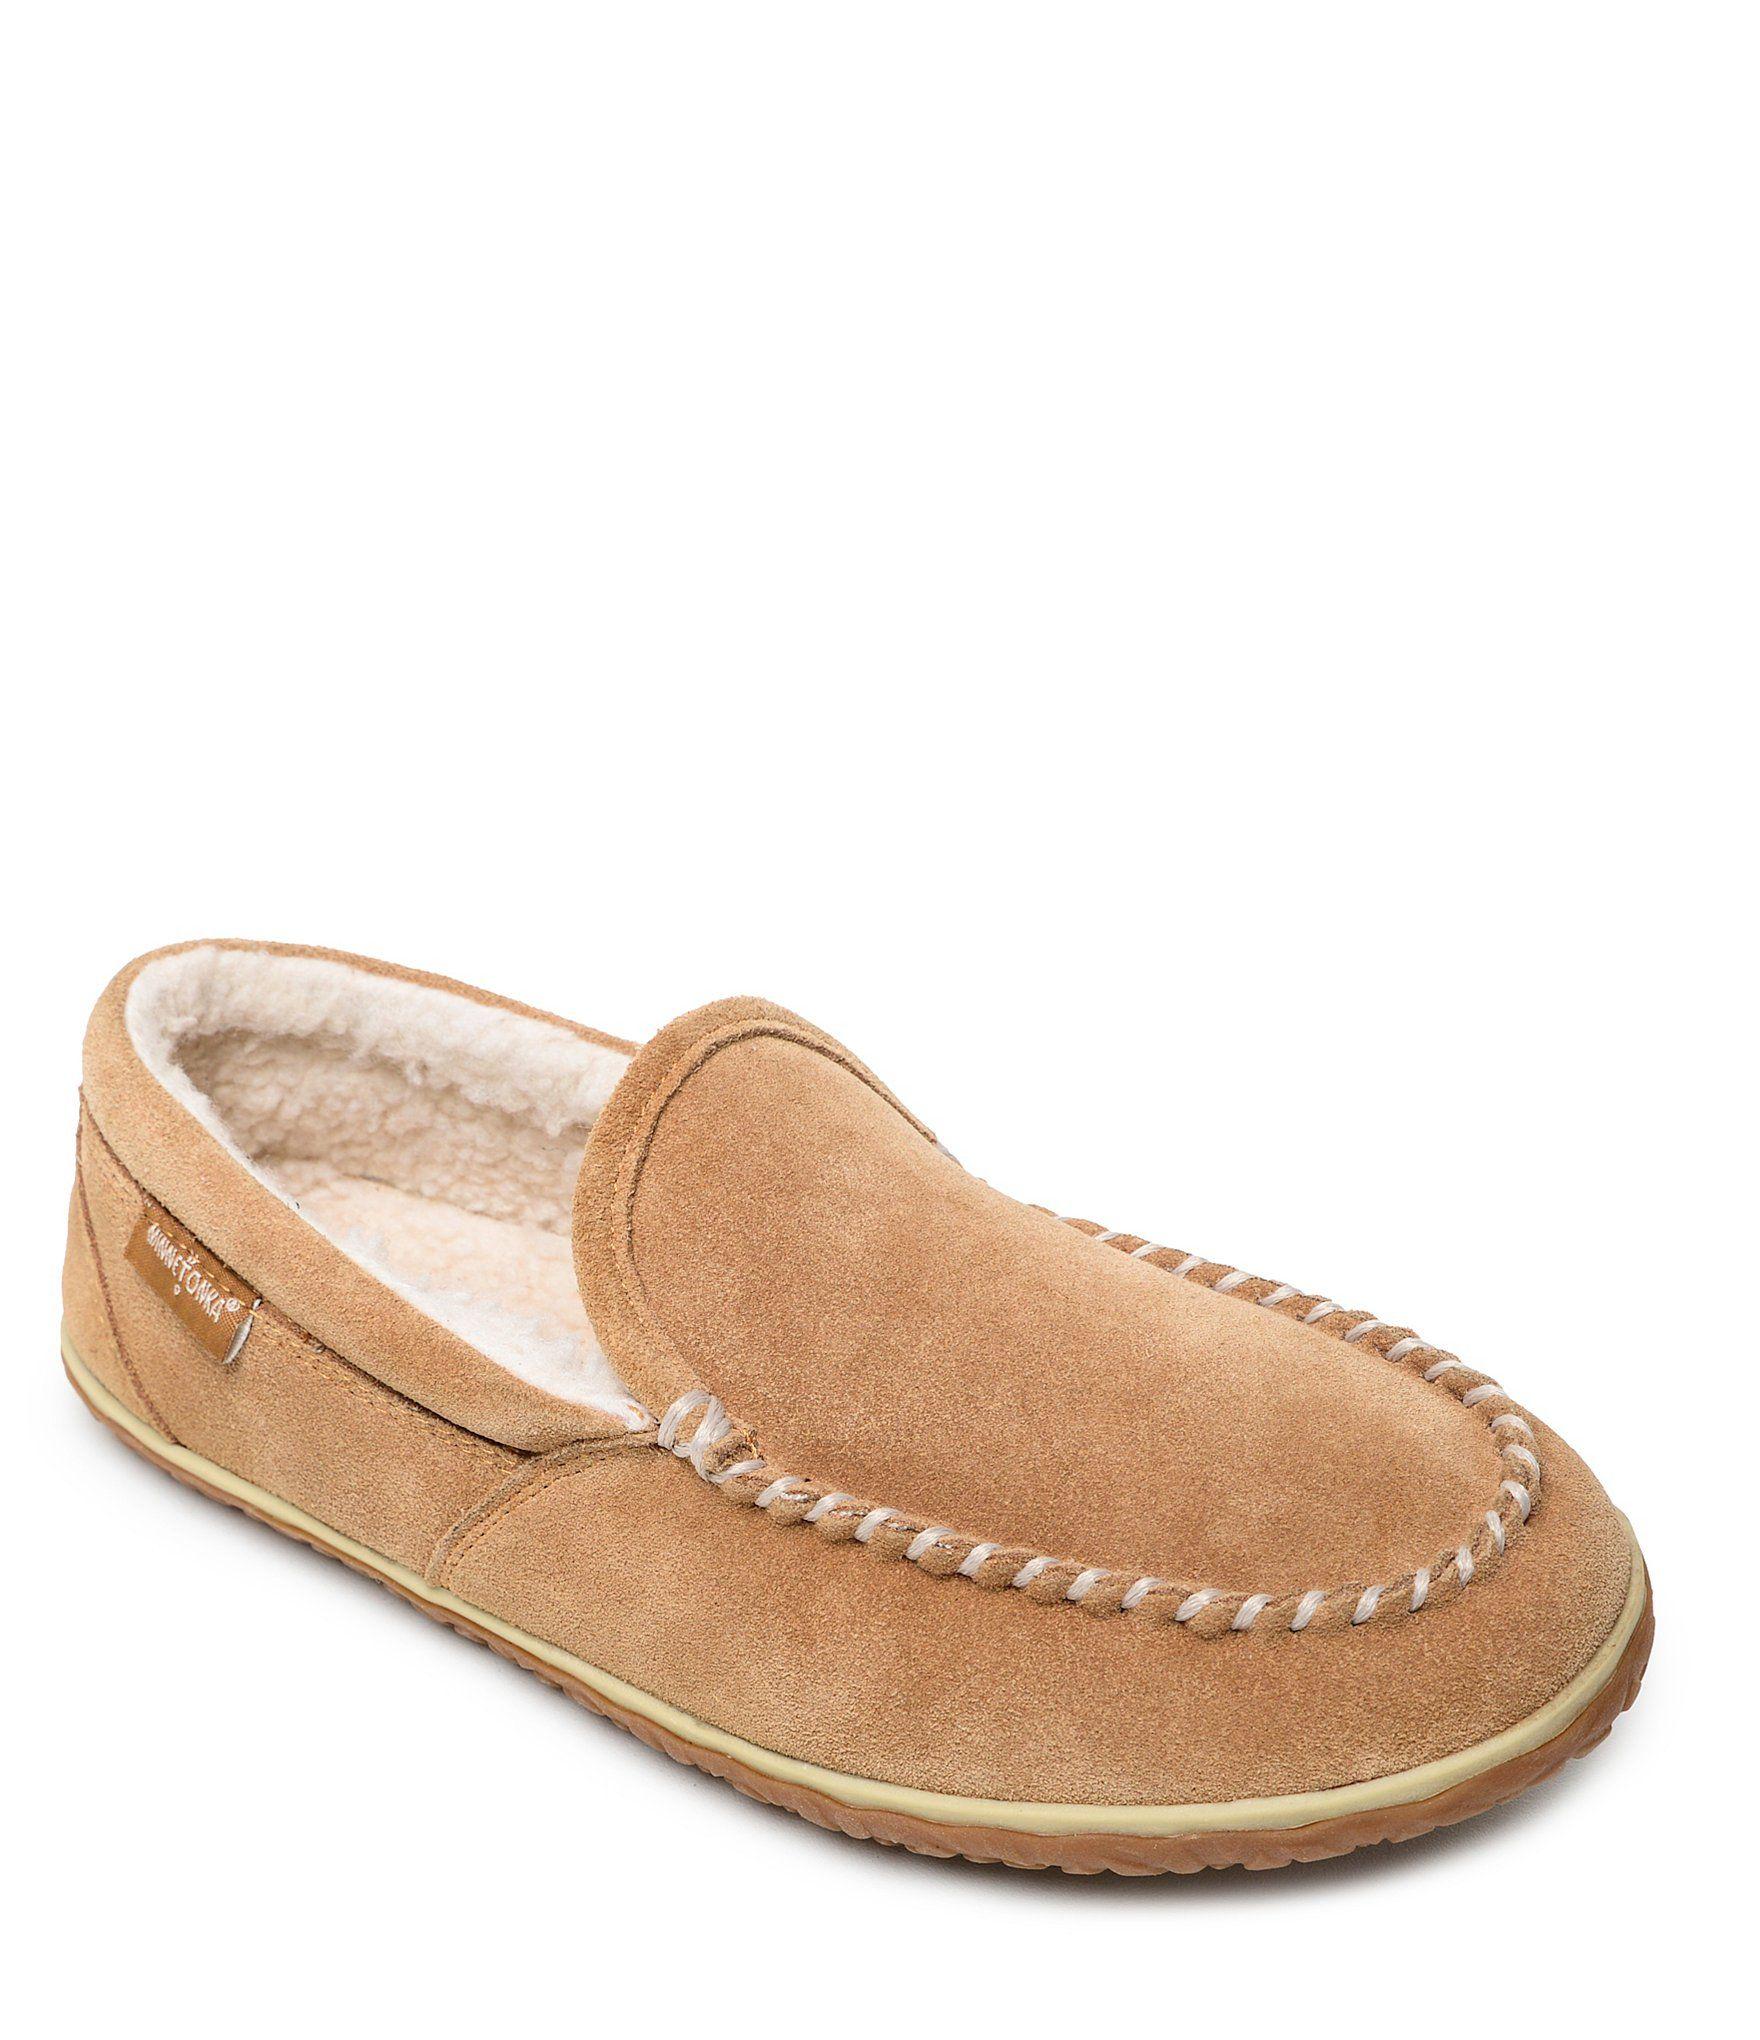 dillards mens slippers